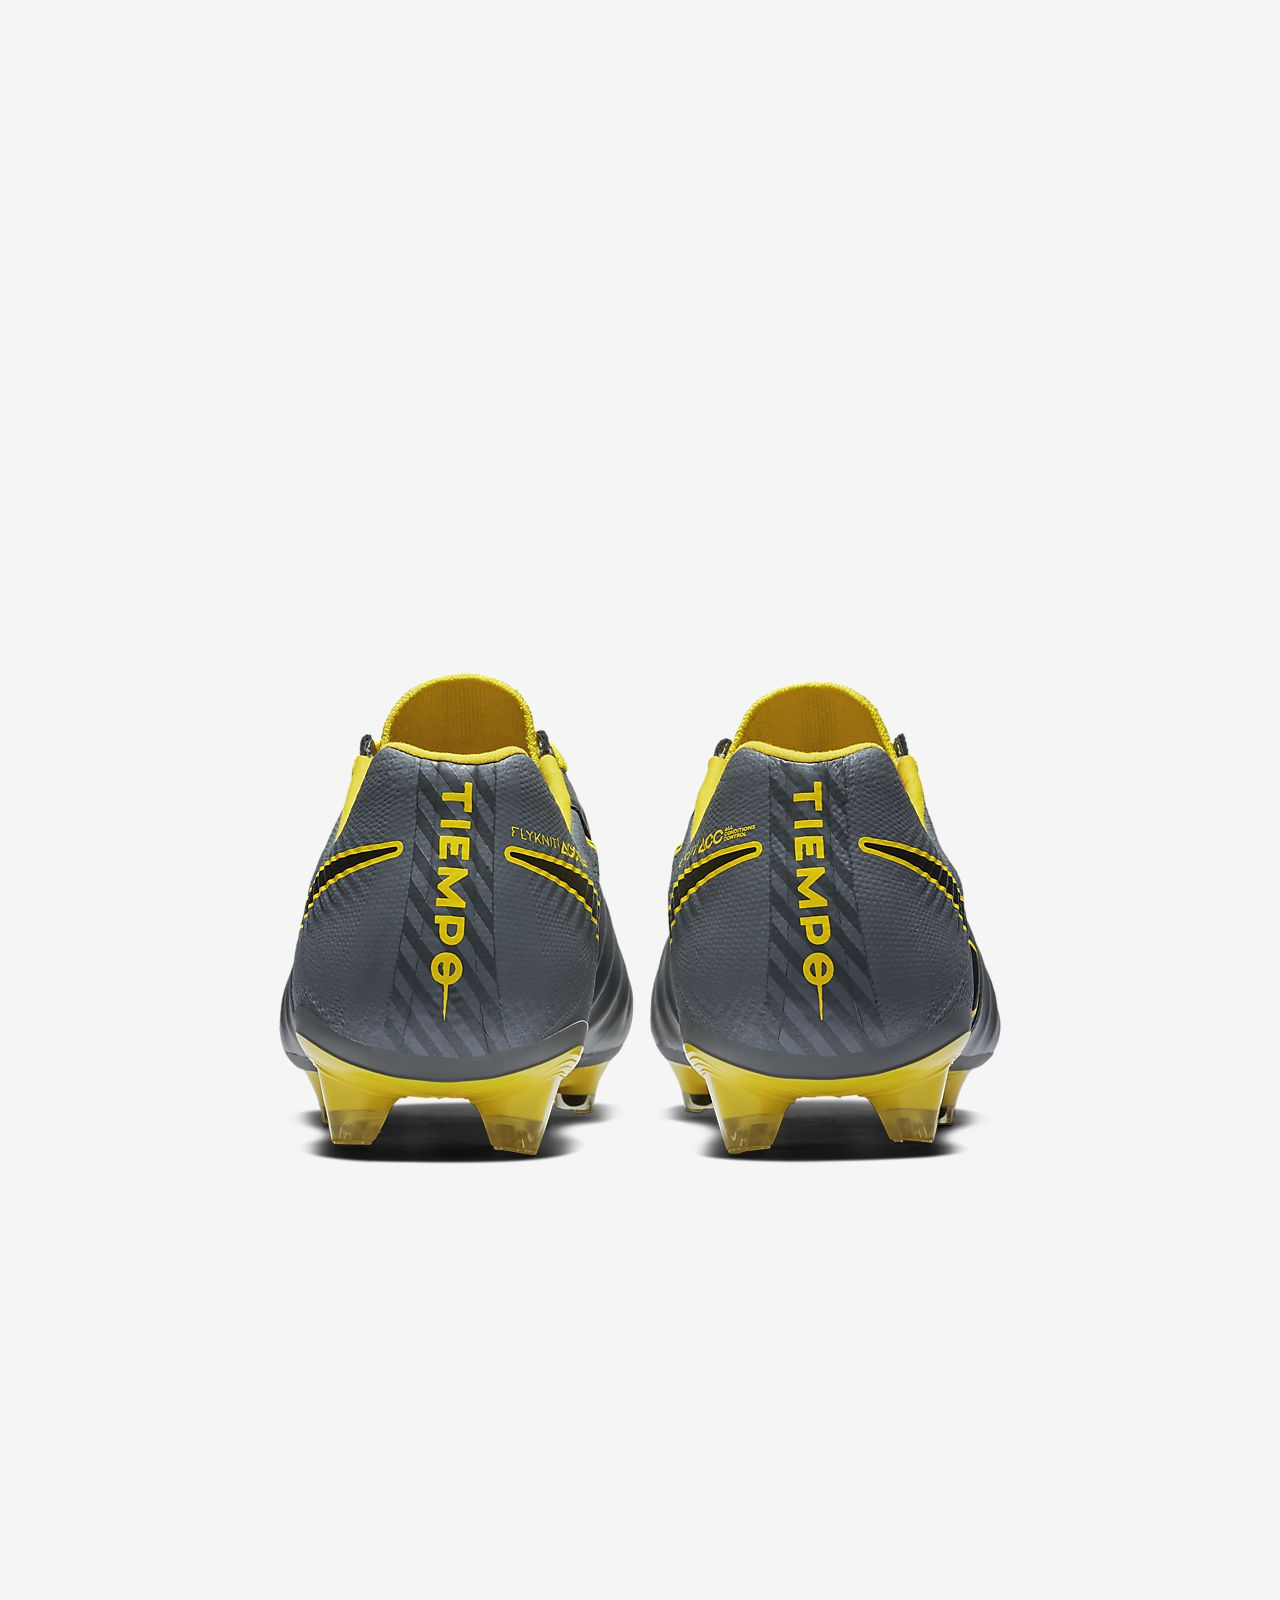 387f5d33b4f7bc Nike Legend 7 Elite FG Game Over Firm-Ground Football Boot. Nike.com AU